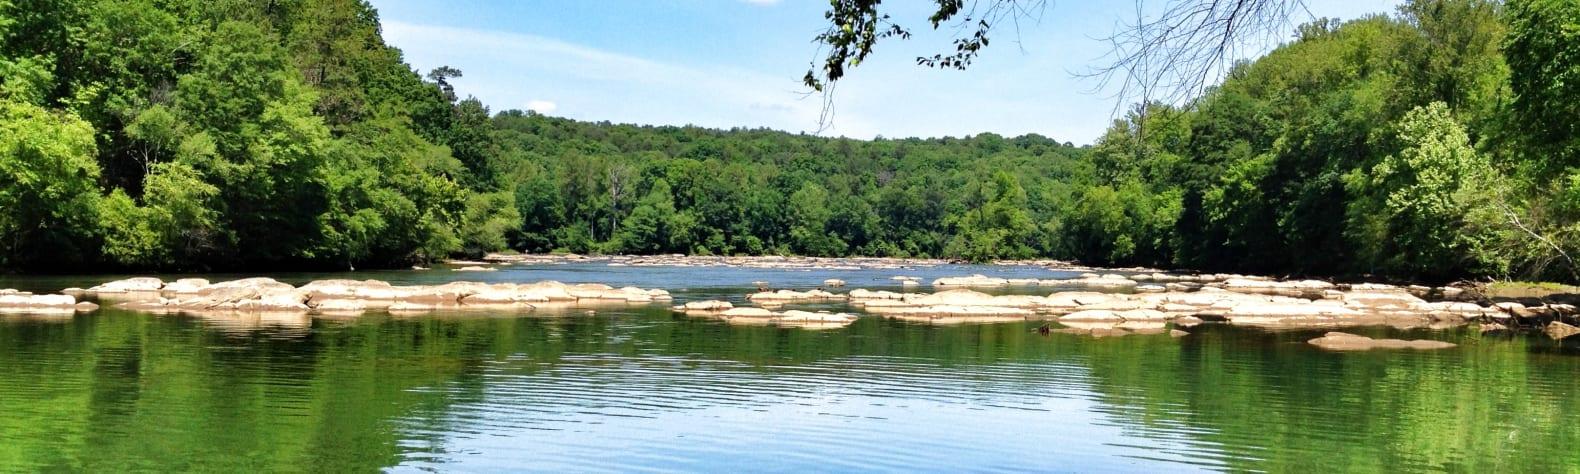 Chattahoochee River National Recreation Area